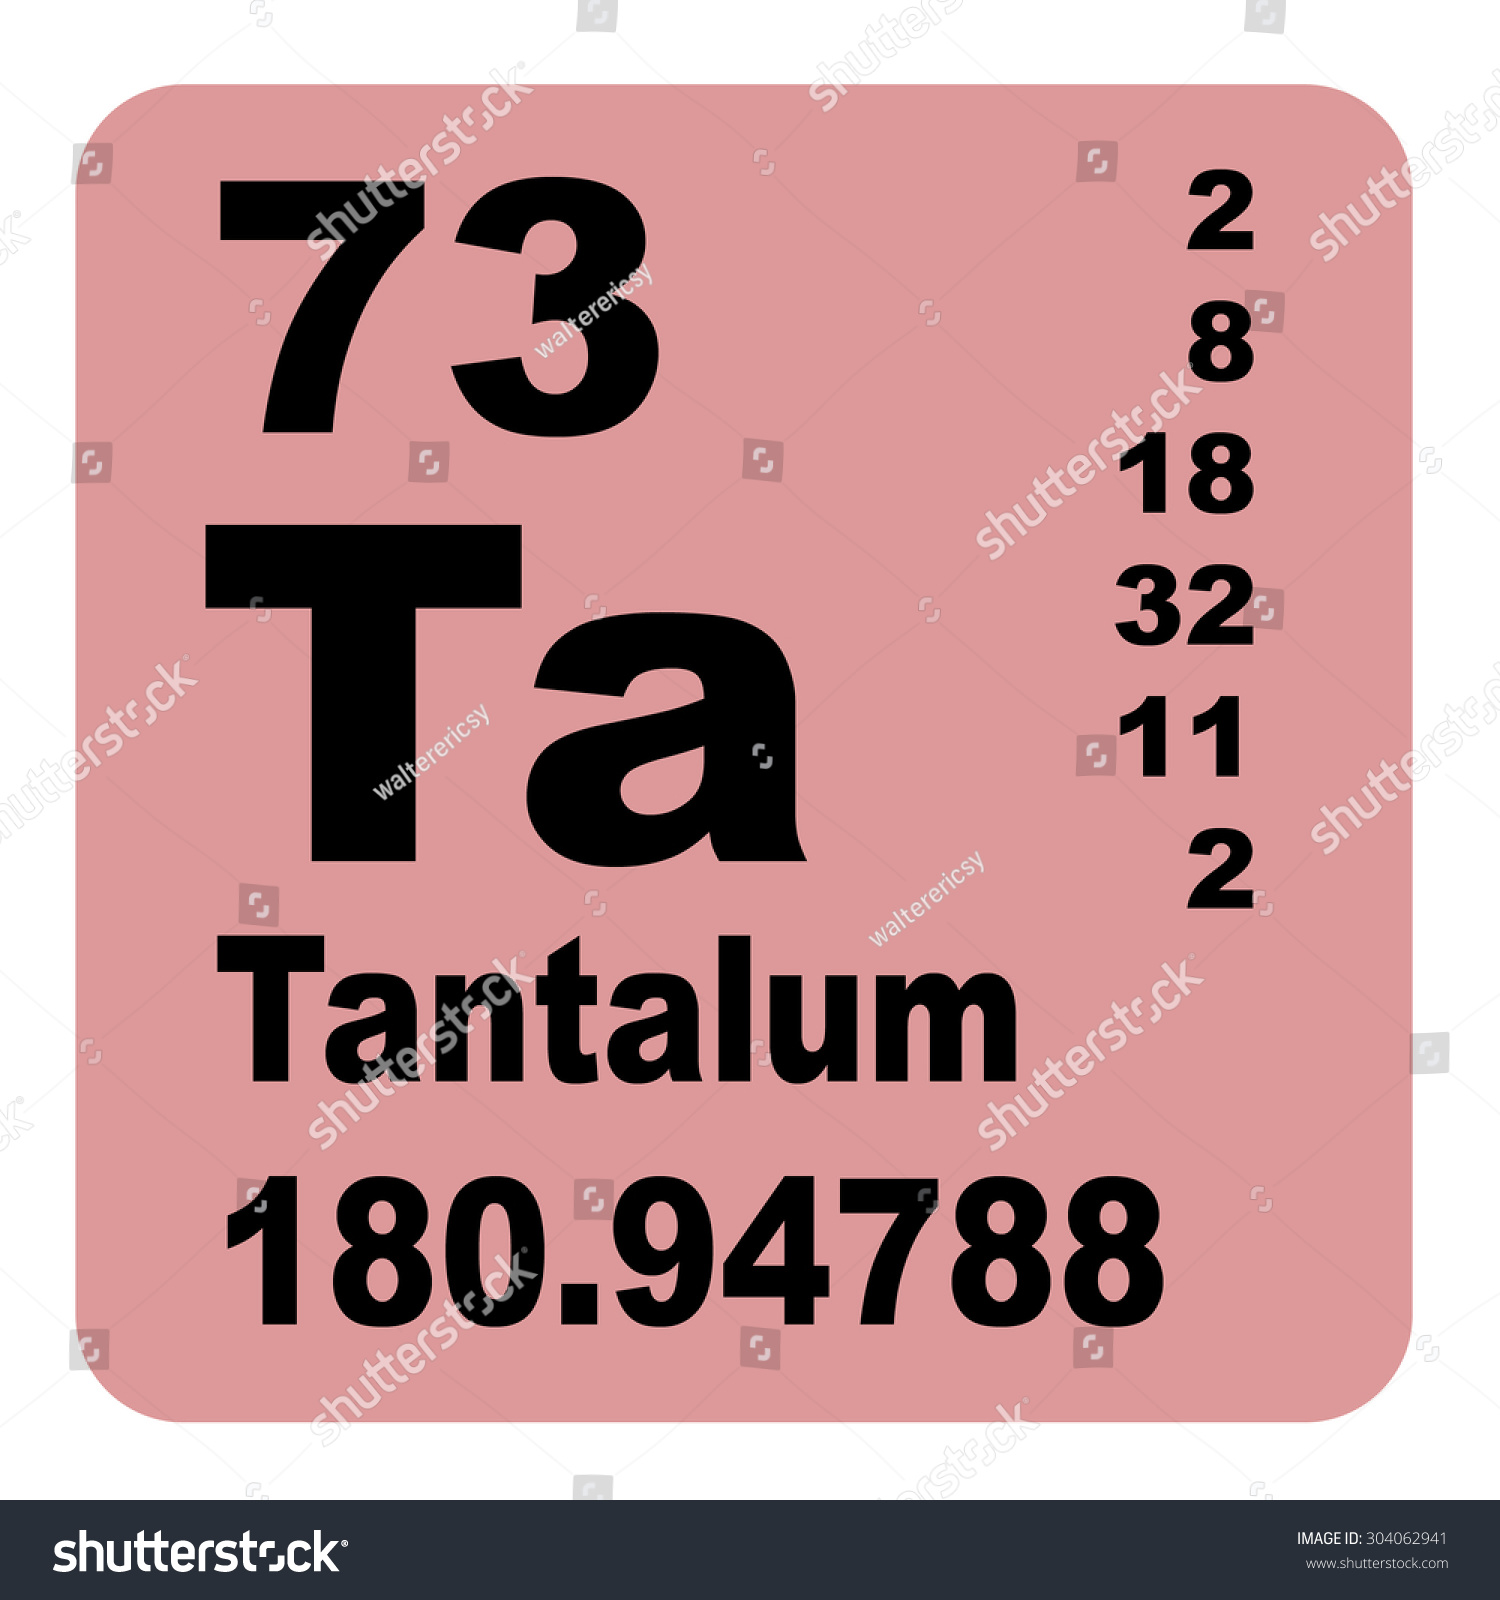 Tantalum periodic table elements stock illustration 304062941 tantalum periodic table of elements gamestrikefo Gallery